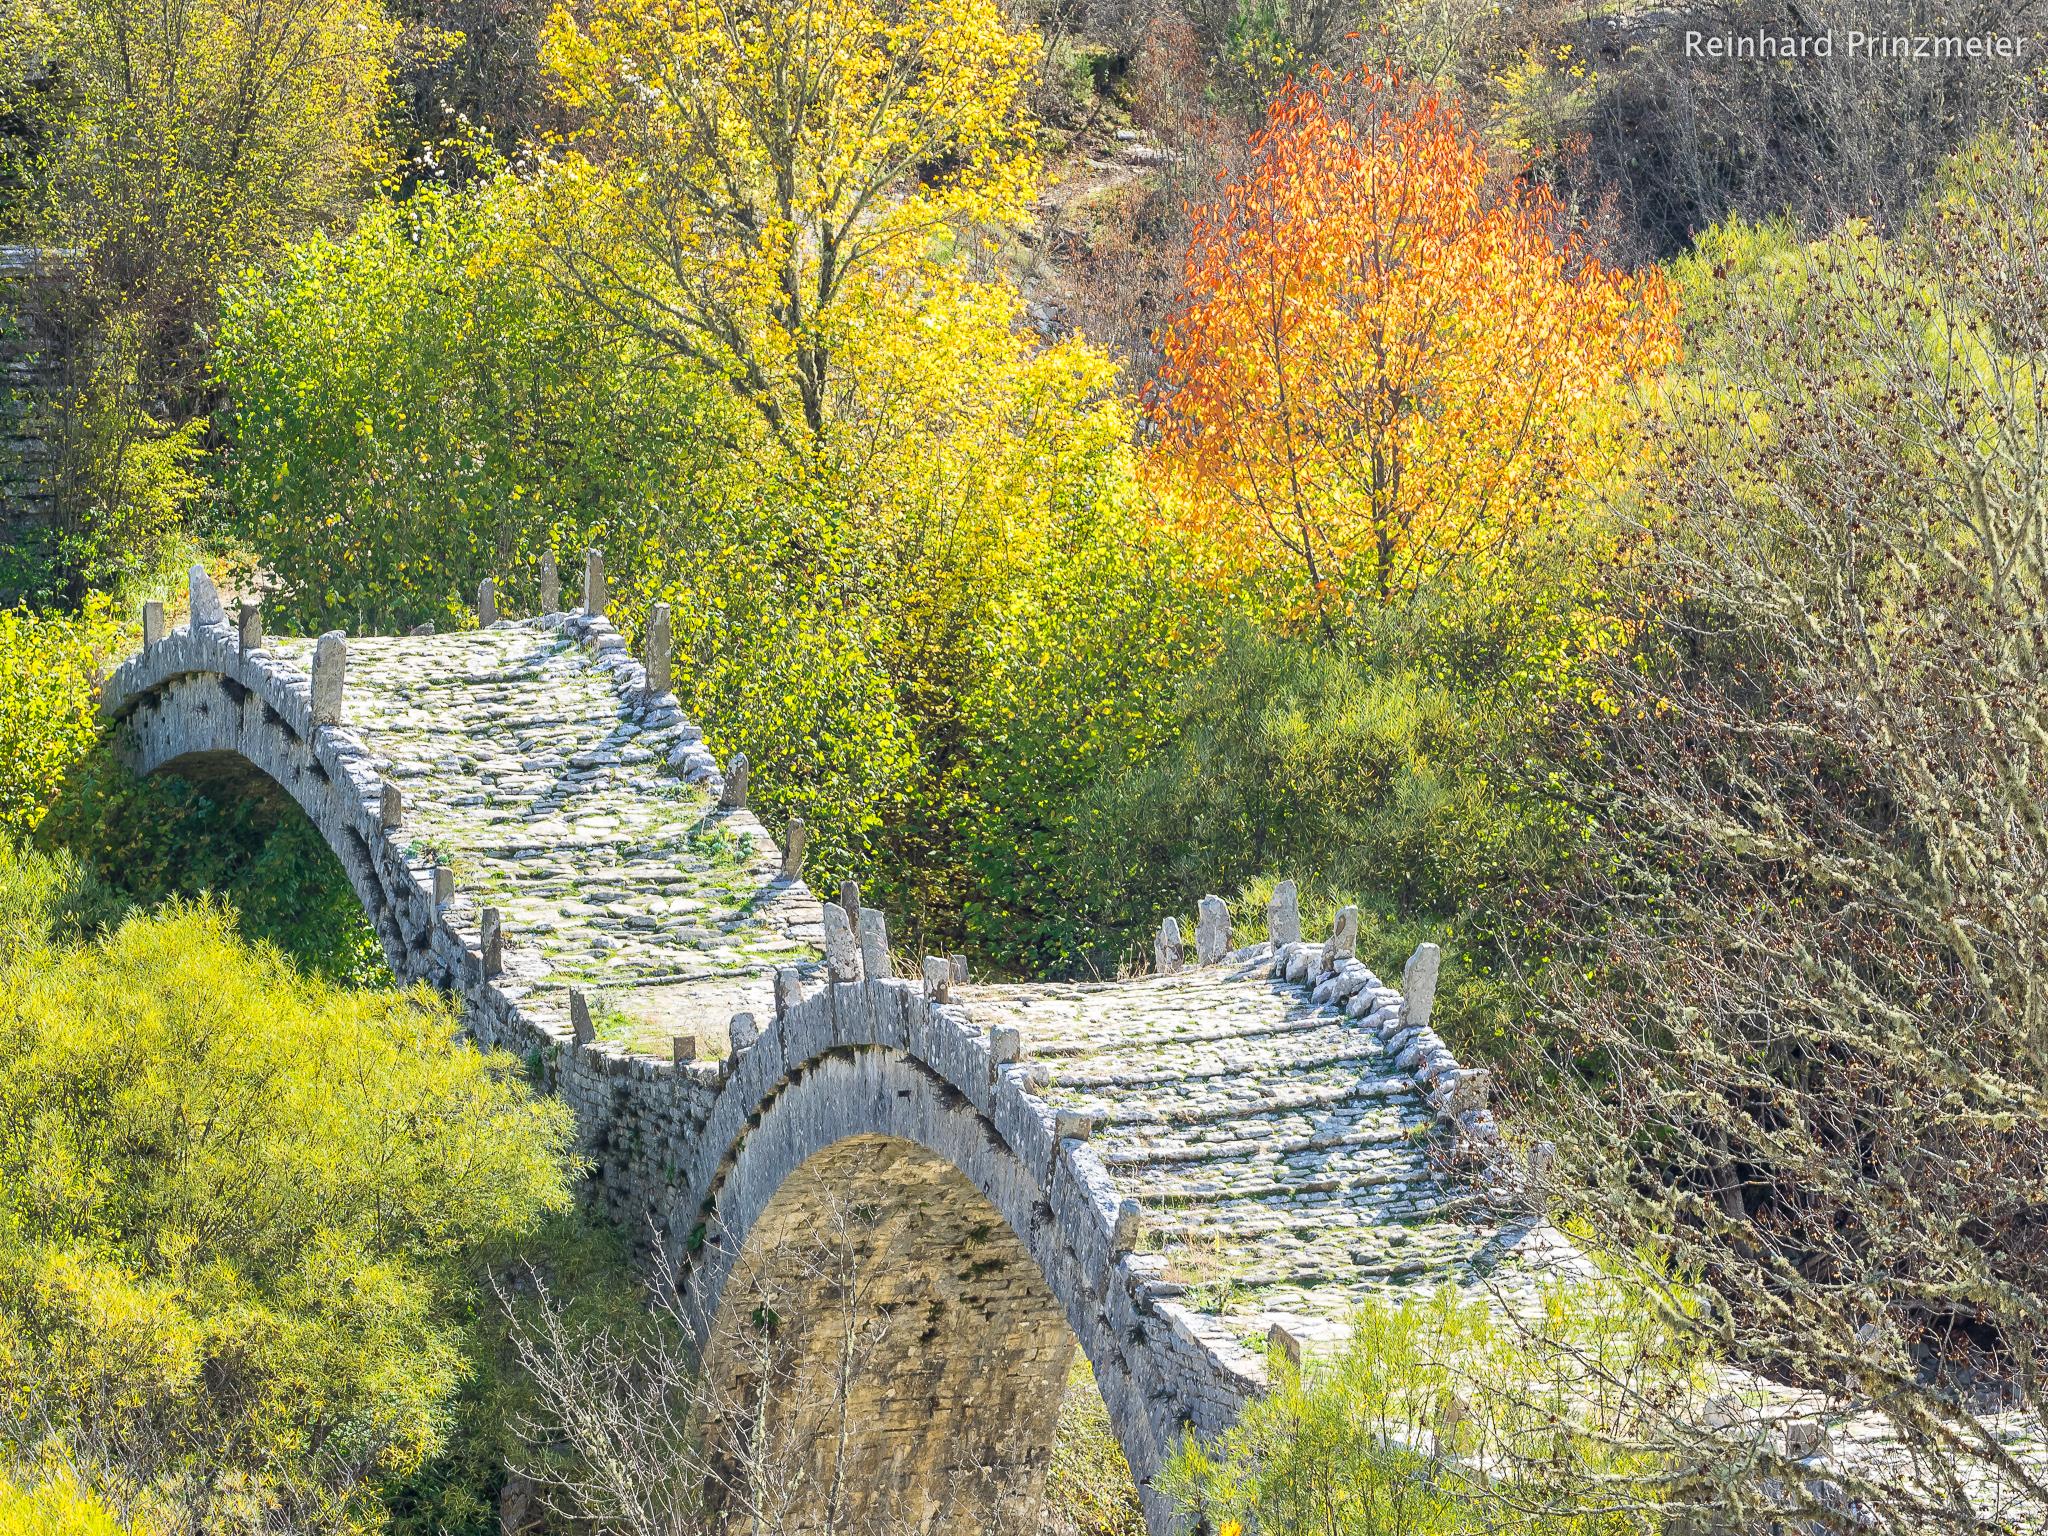 Kalogeriko Bridge, Greece